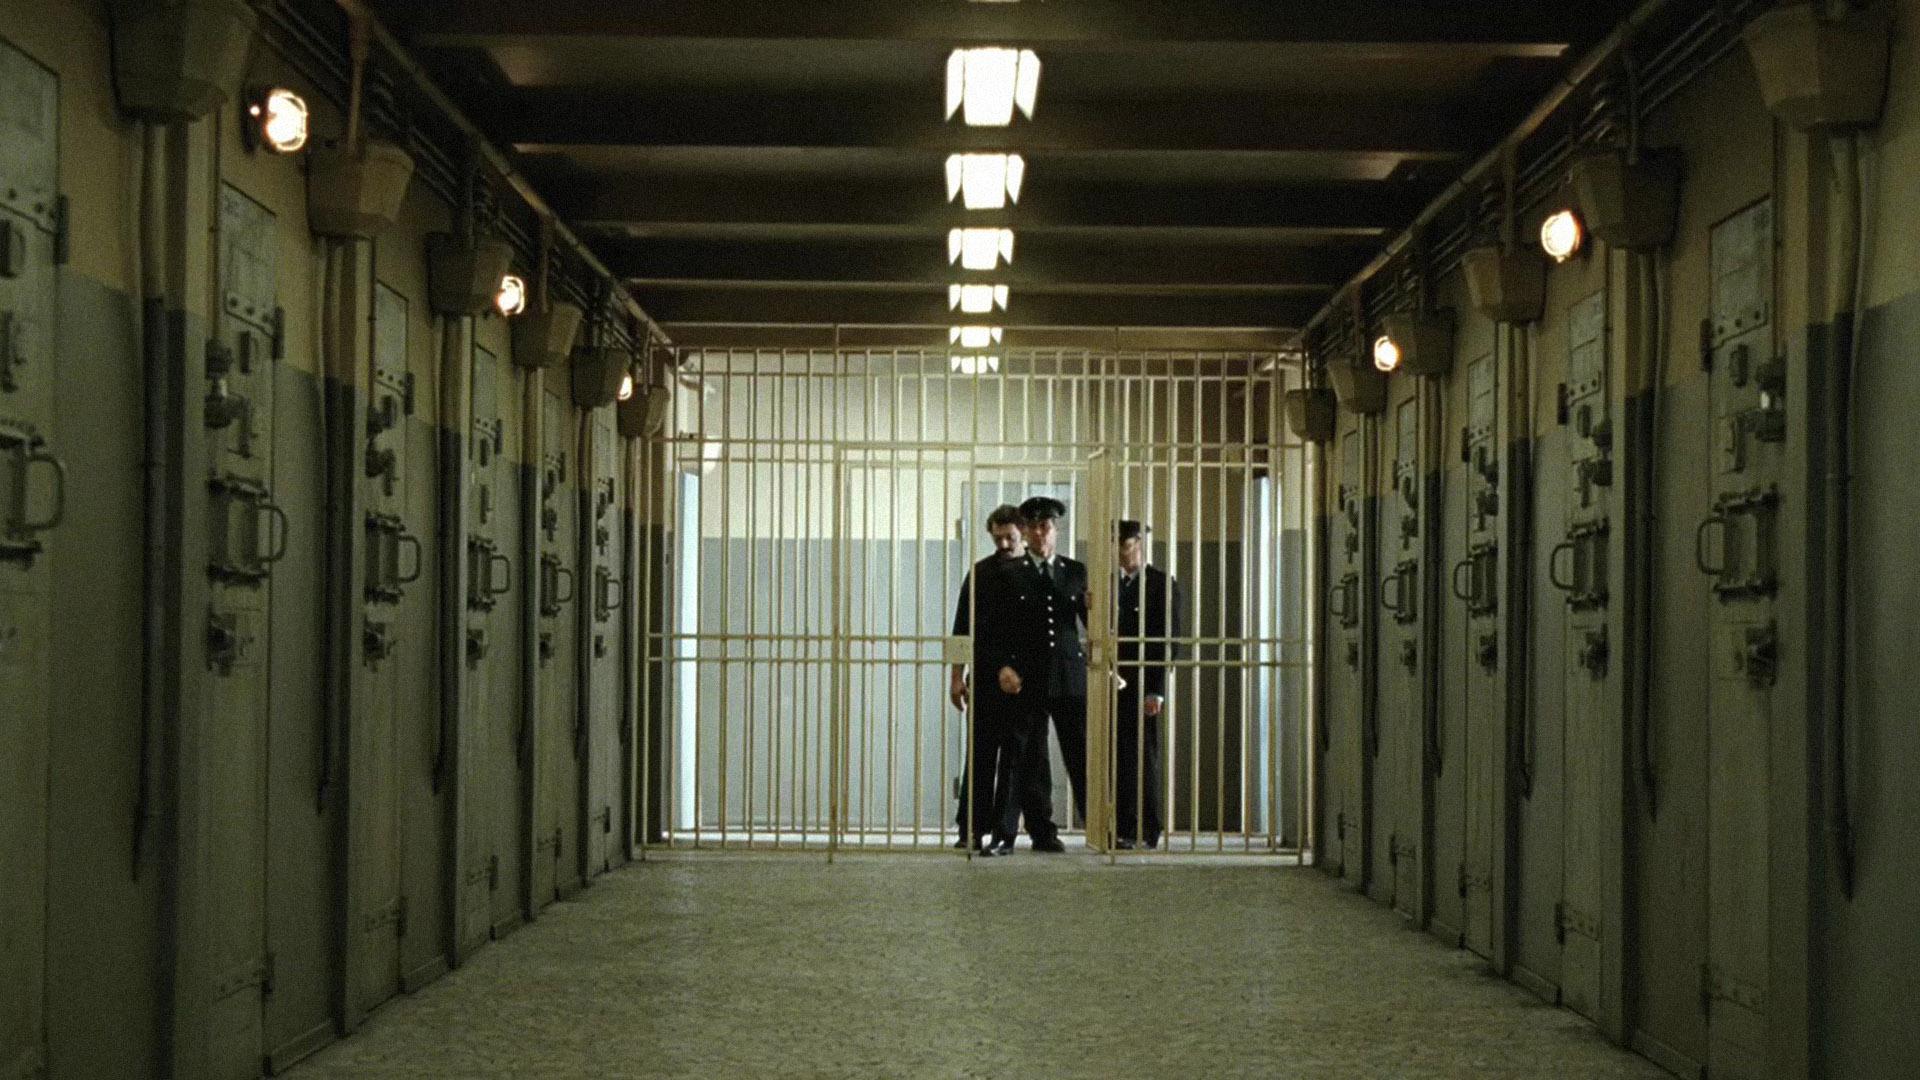 Jail Cell Wallpaper Prison wallpapers 1920x1080